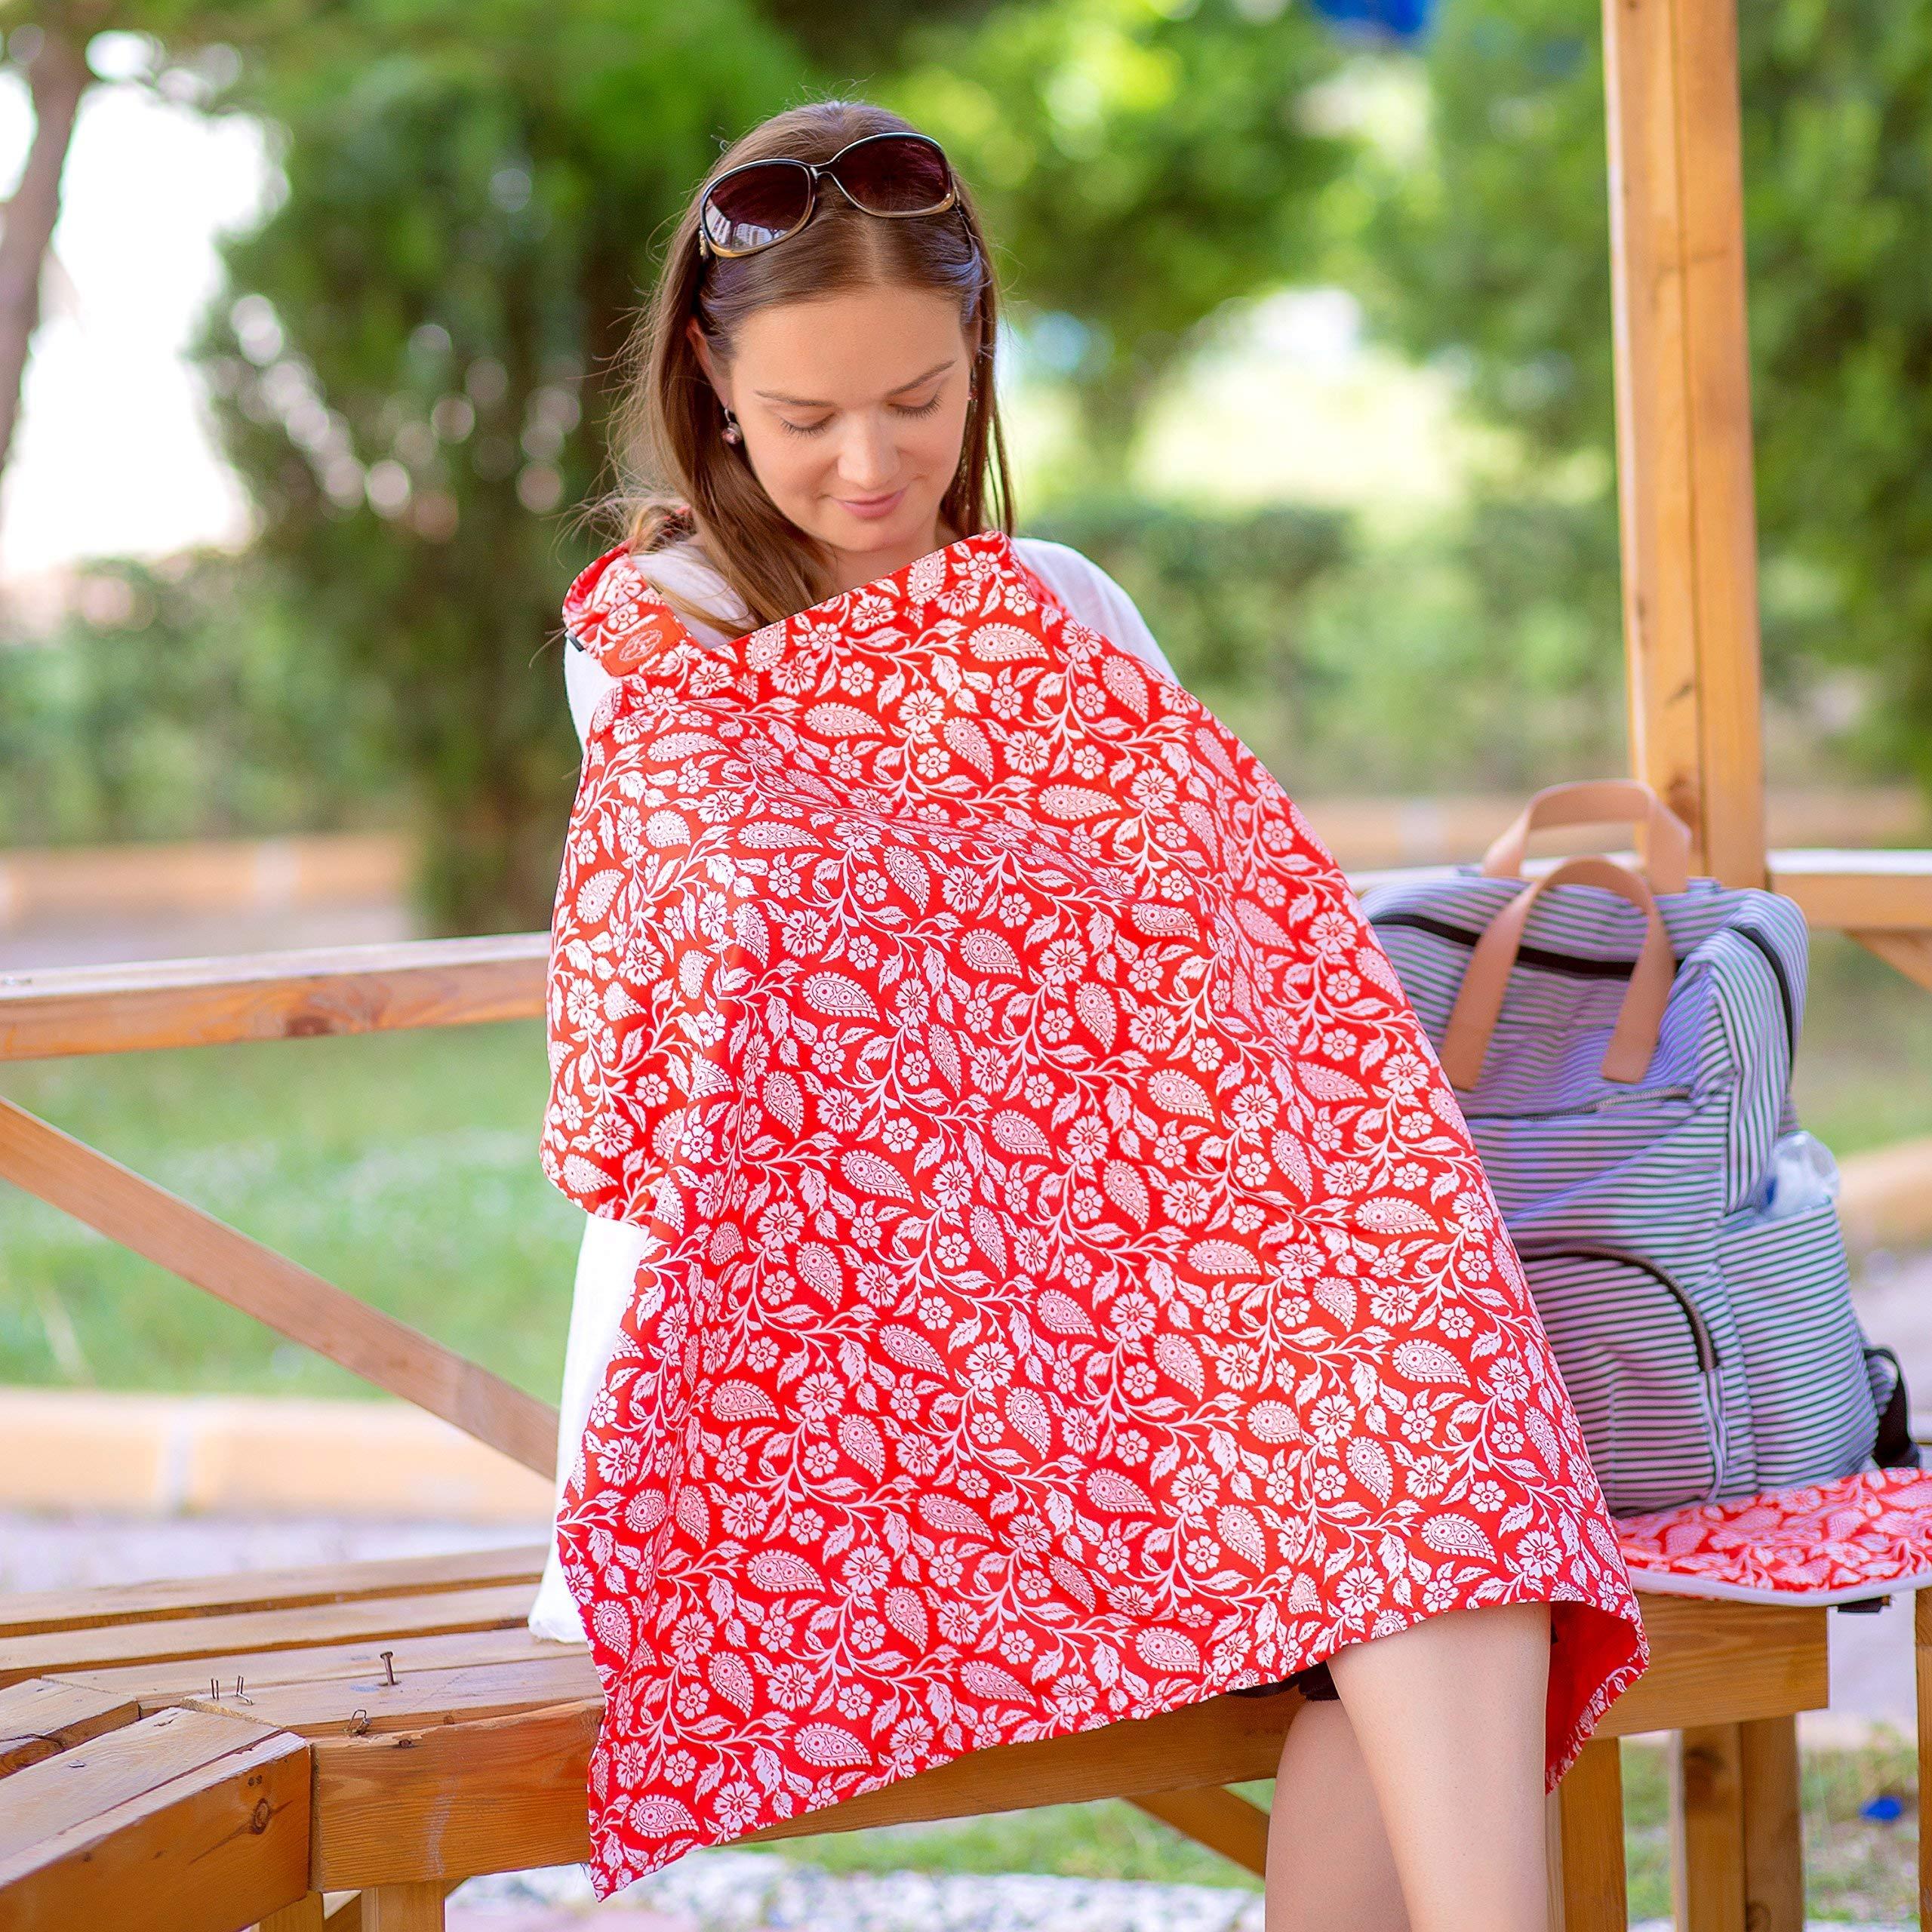 IAMA Complete ❤ New Reversible ❤ Nursing Cover Up 100% Cotton Hypoallergenic Breastfeeding Nursing Cover Bonus One of A Kind Travel Bag for Infant Nursing Cover